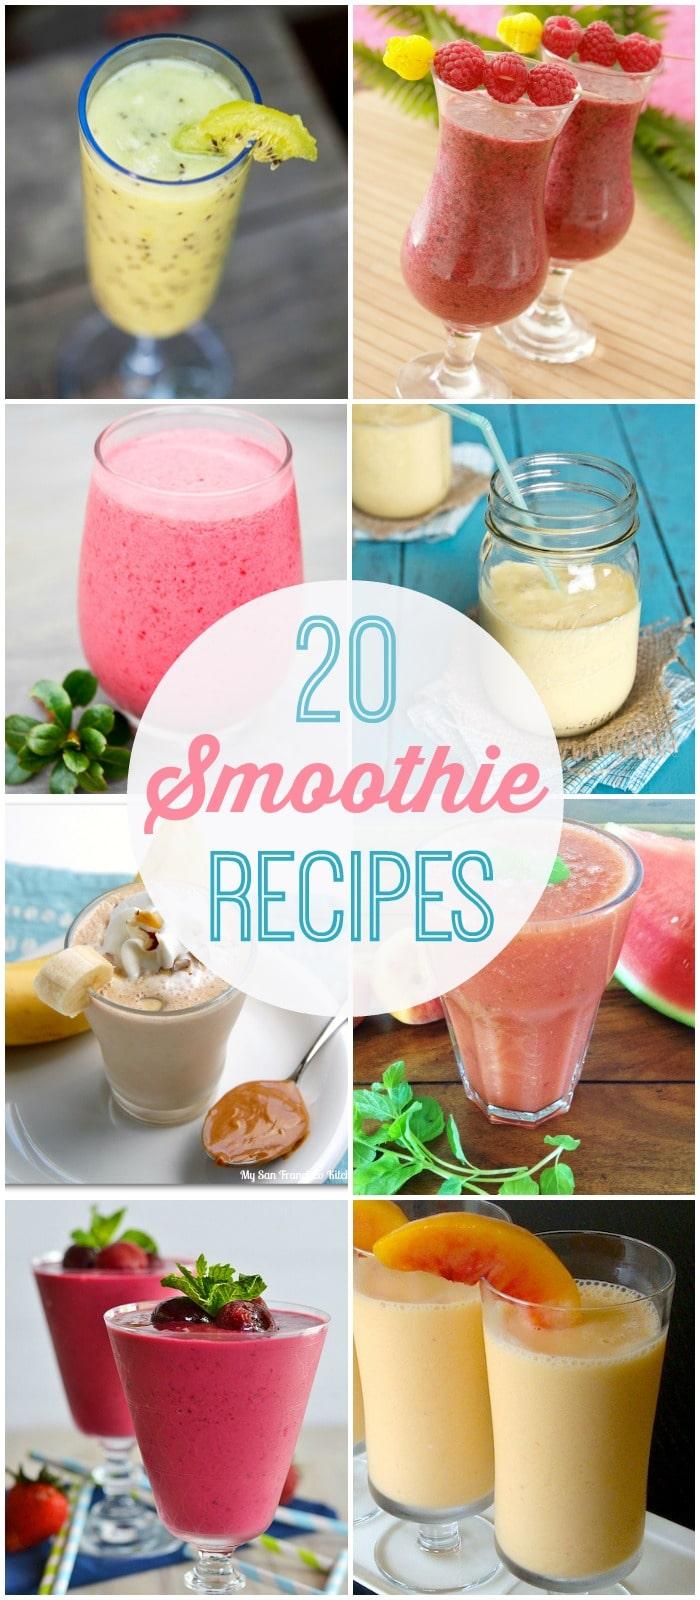 20 smoothie recipes - perfectly refreshing treats for those hot summer days! { lilluna.com }